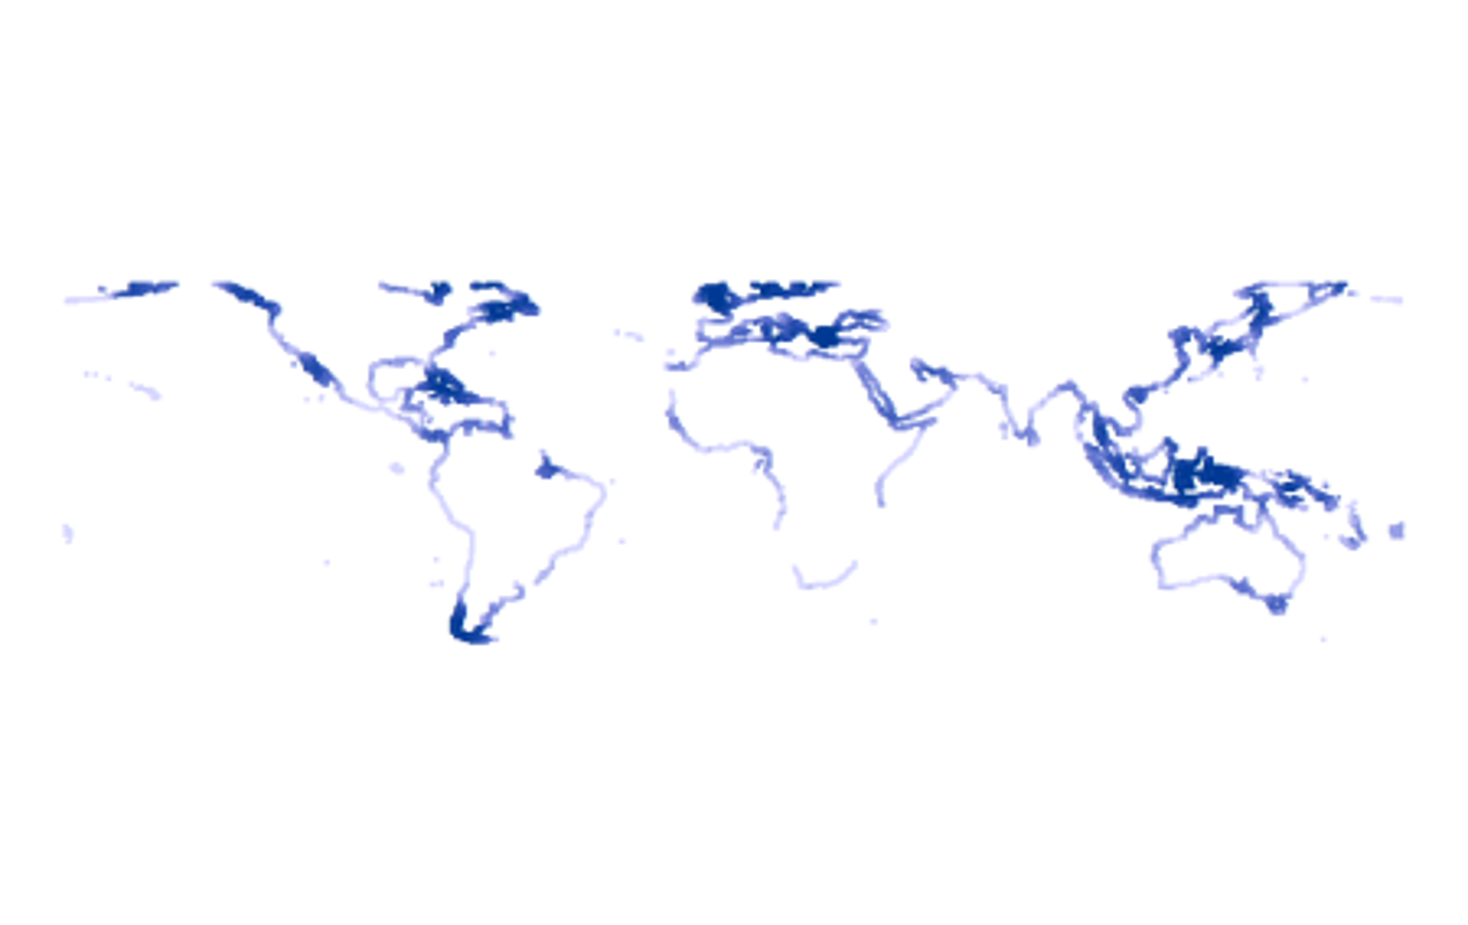 Coastal connectivity around the world